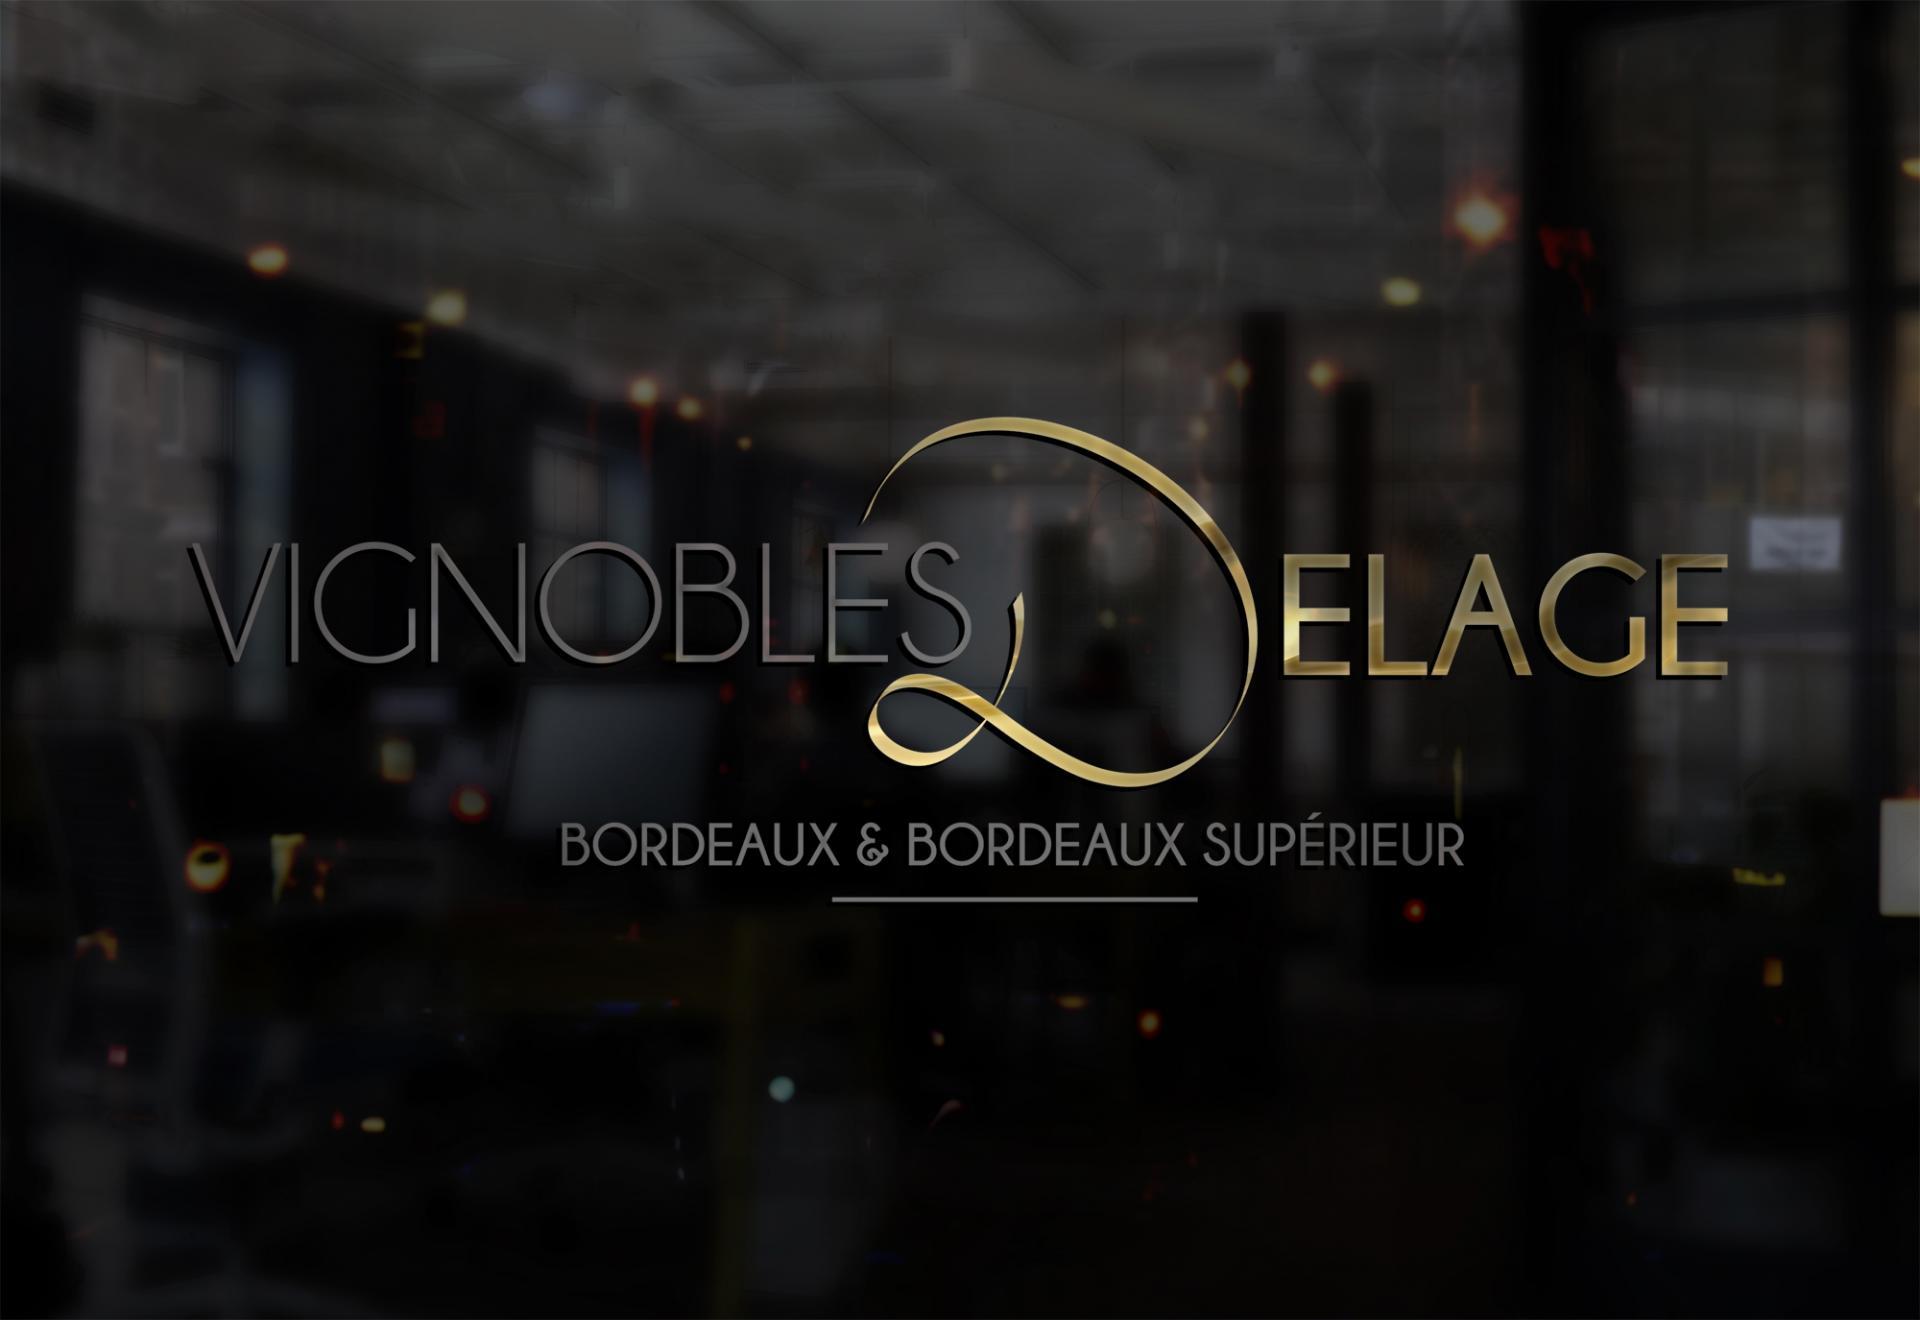 Vignoble delage logotype